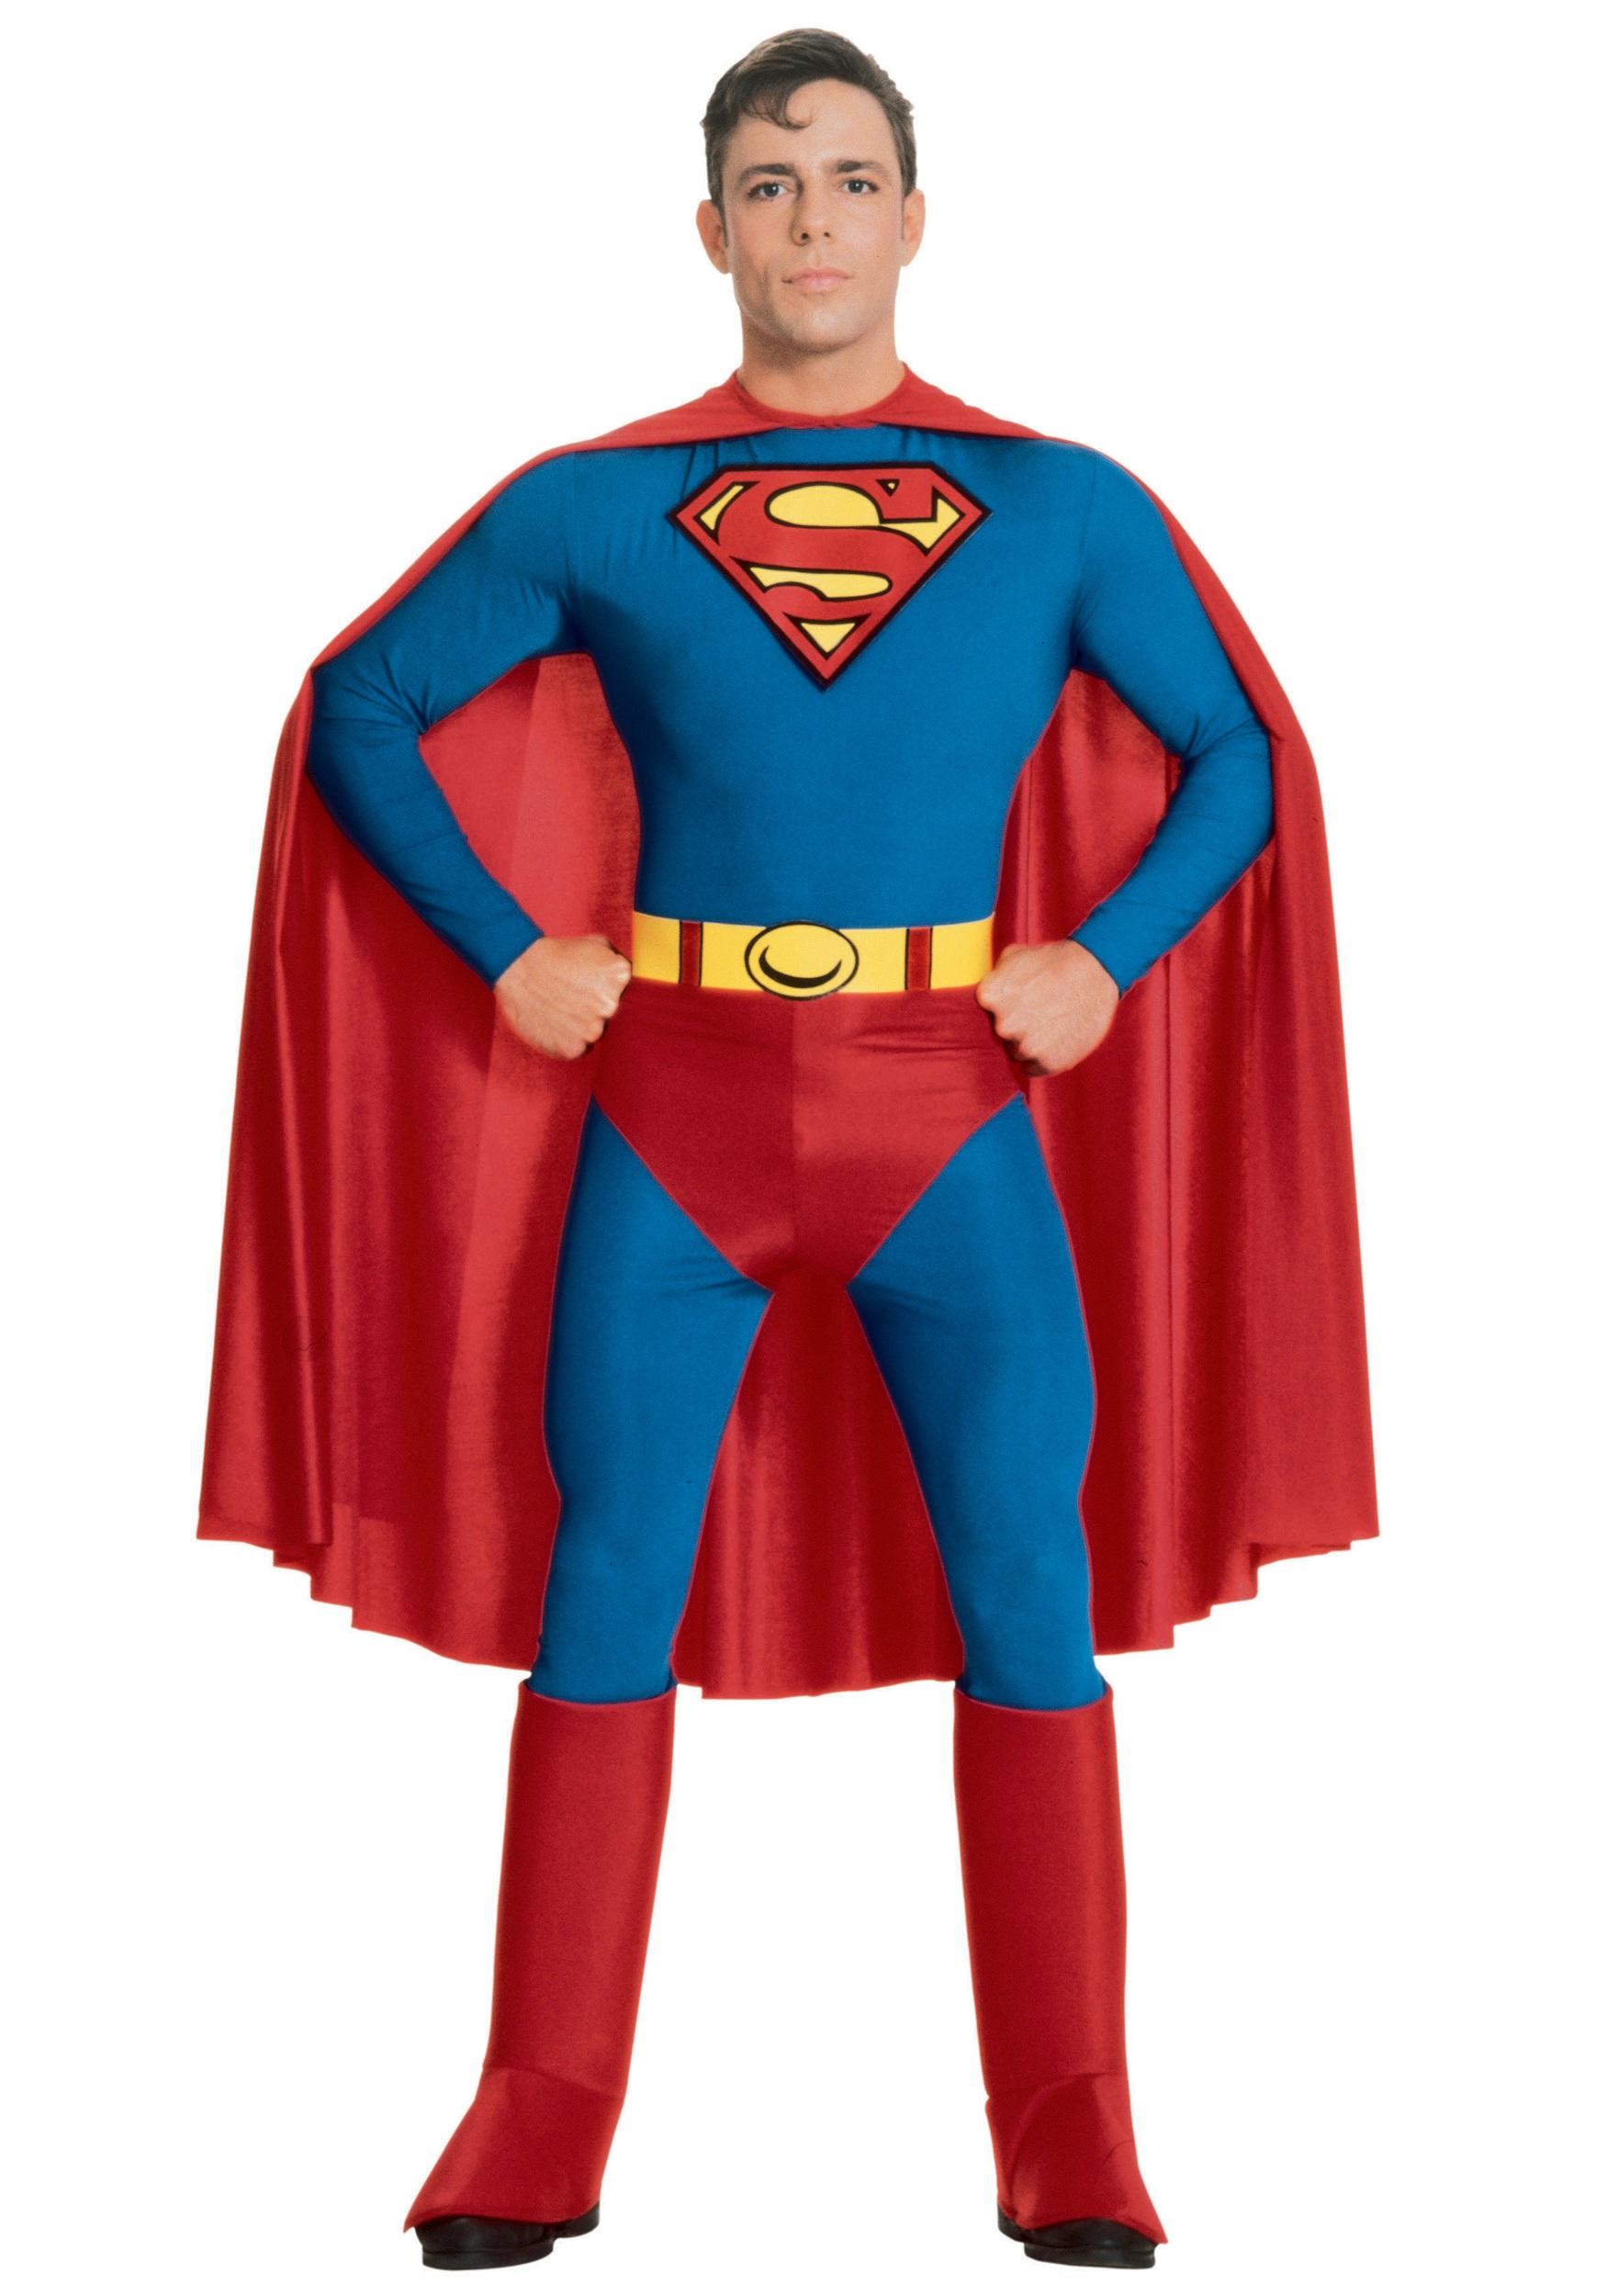 Adult Superman Costume  sc 1 st  Halloween Costumes & Adult Superman Costume - Halloween Costumes